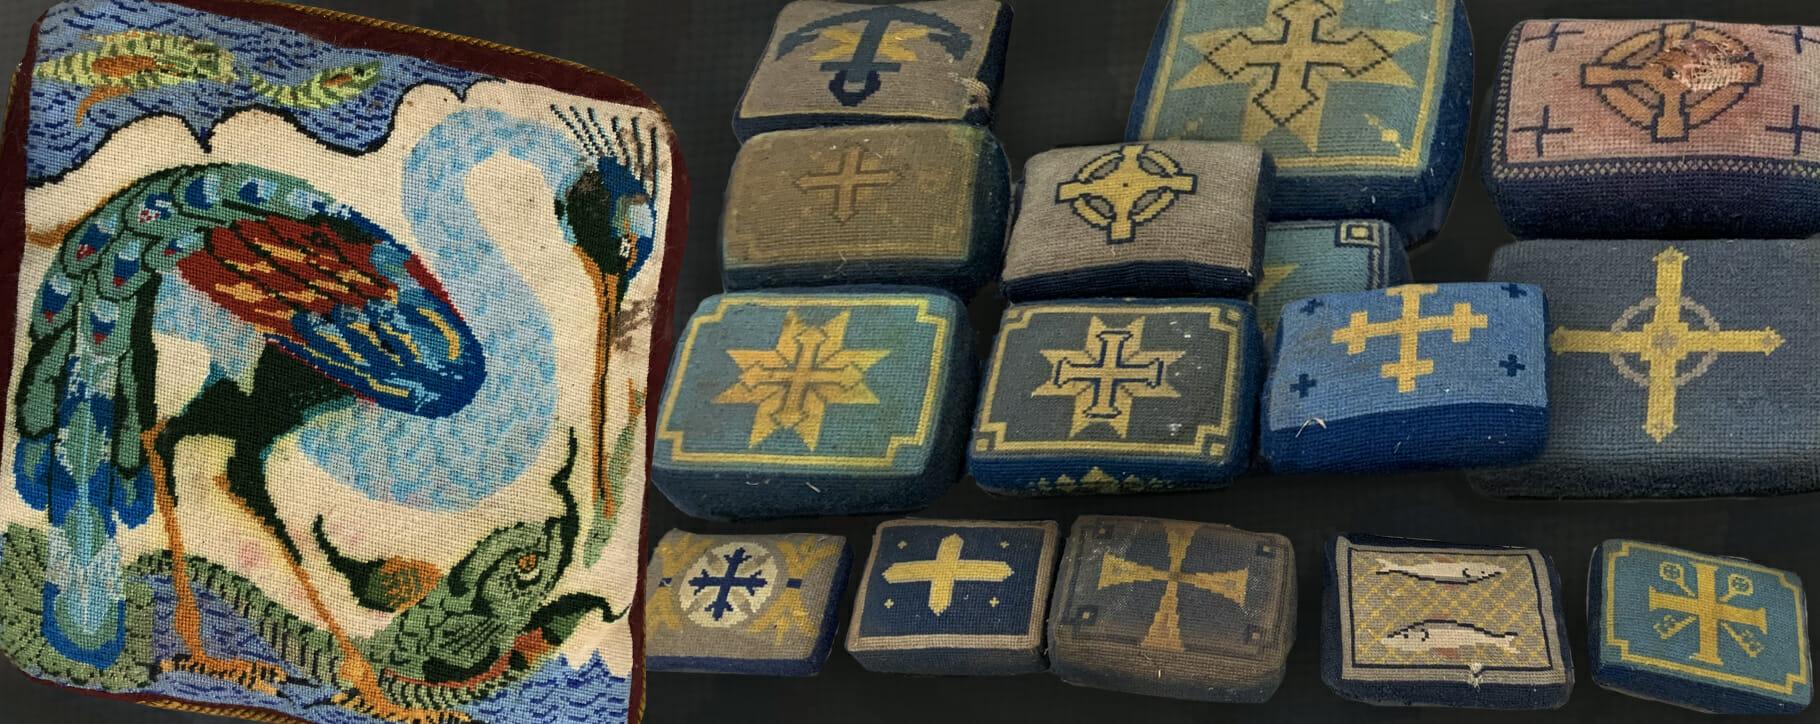 Church Pews Flood Damage Textiles